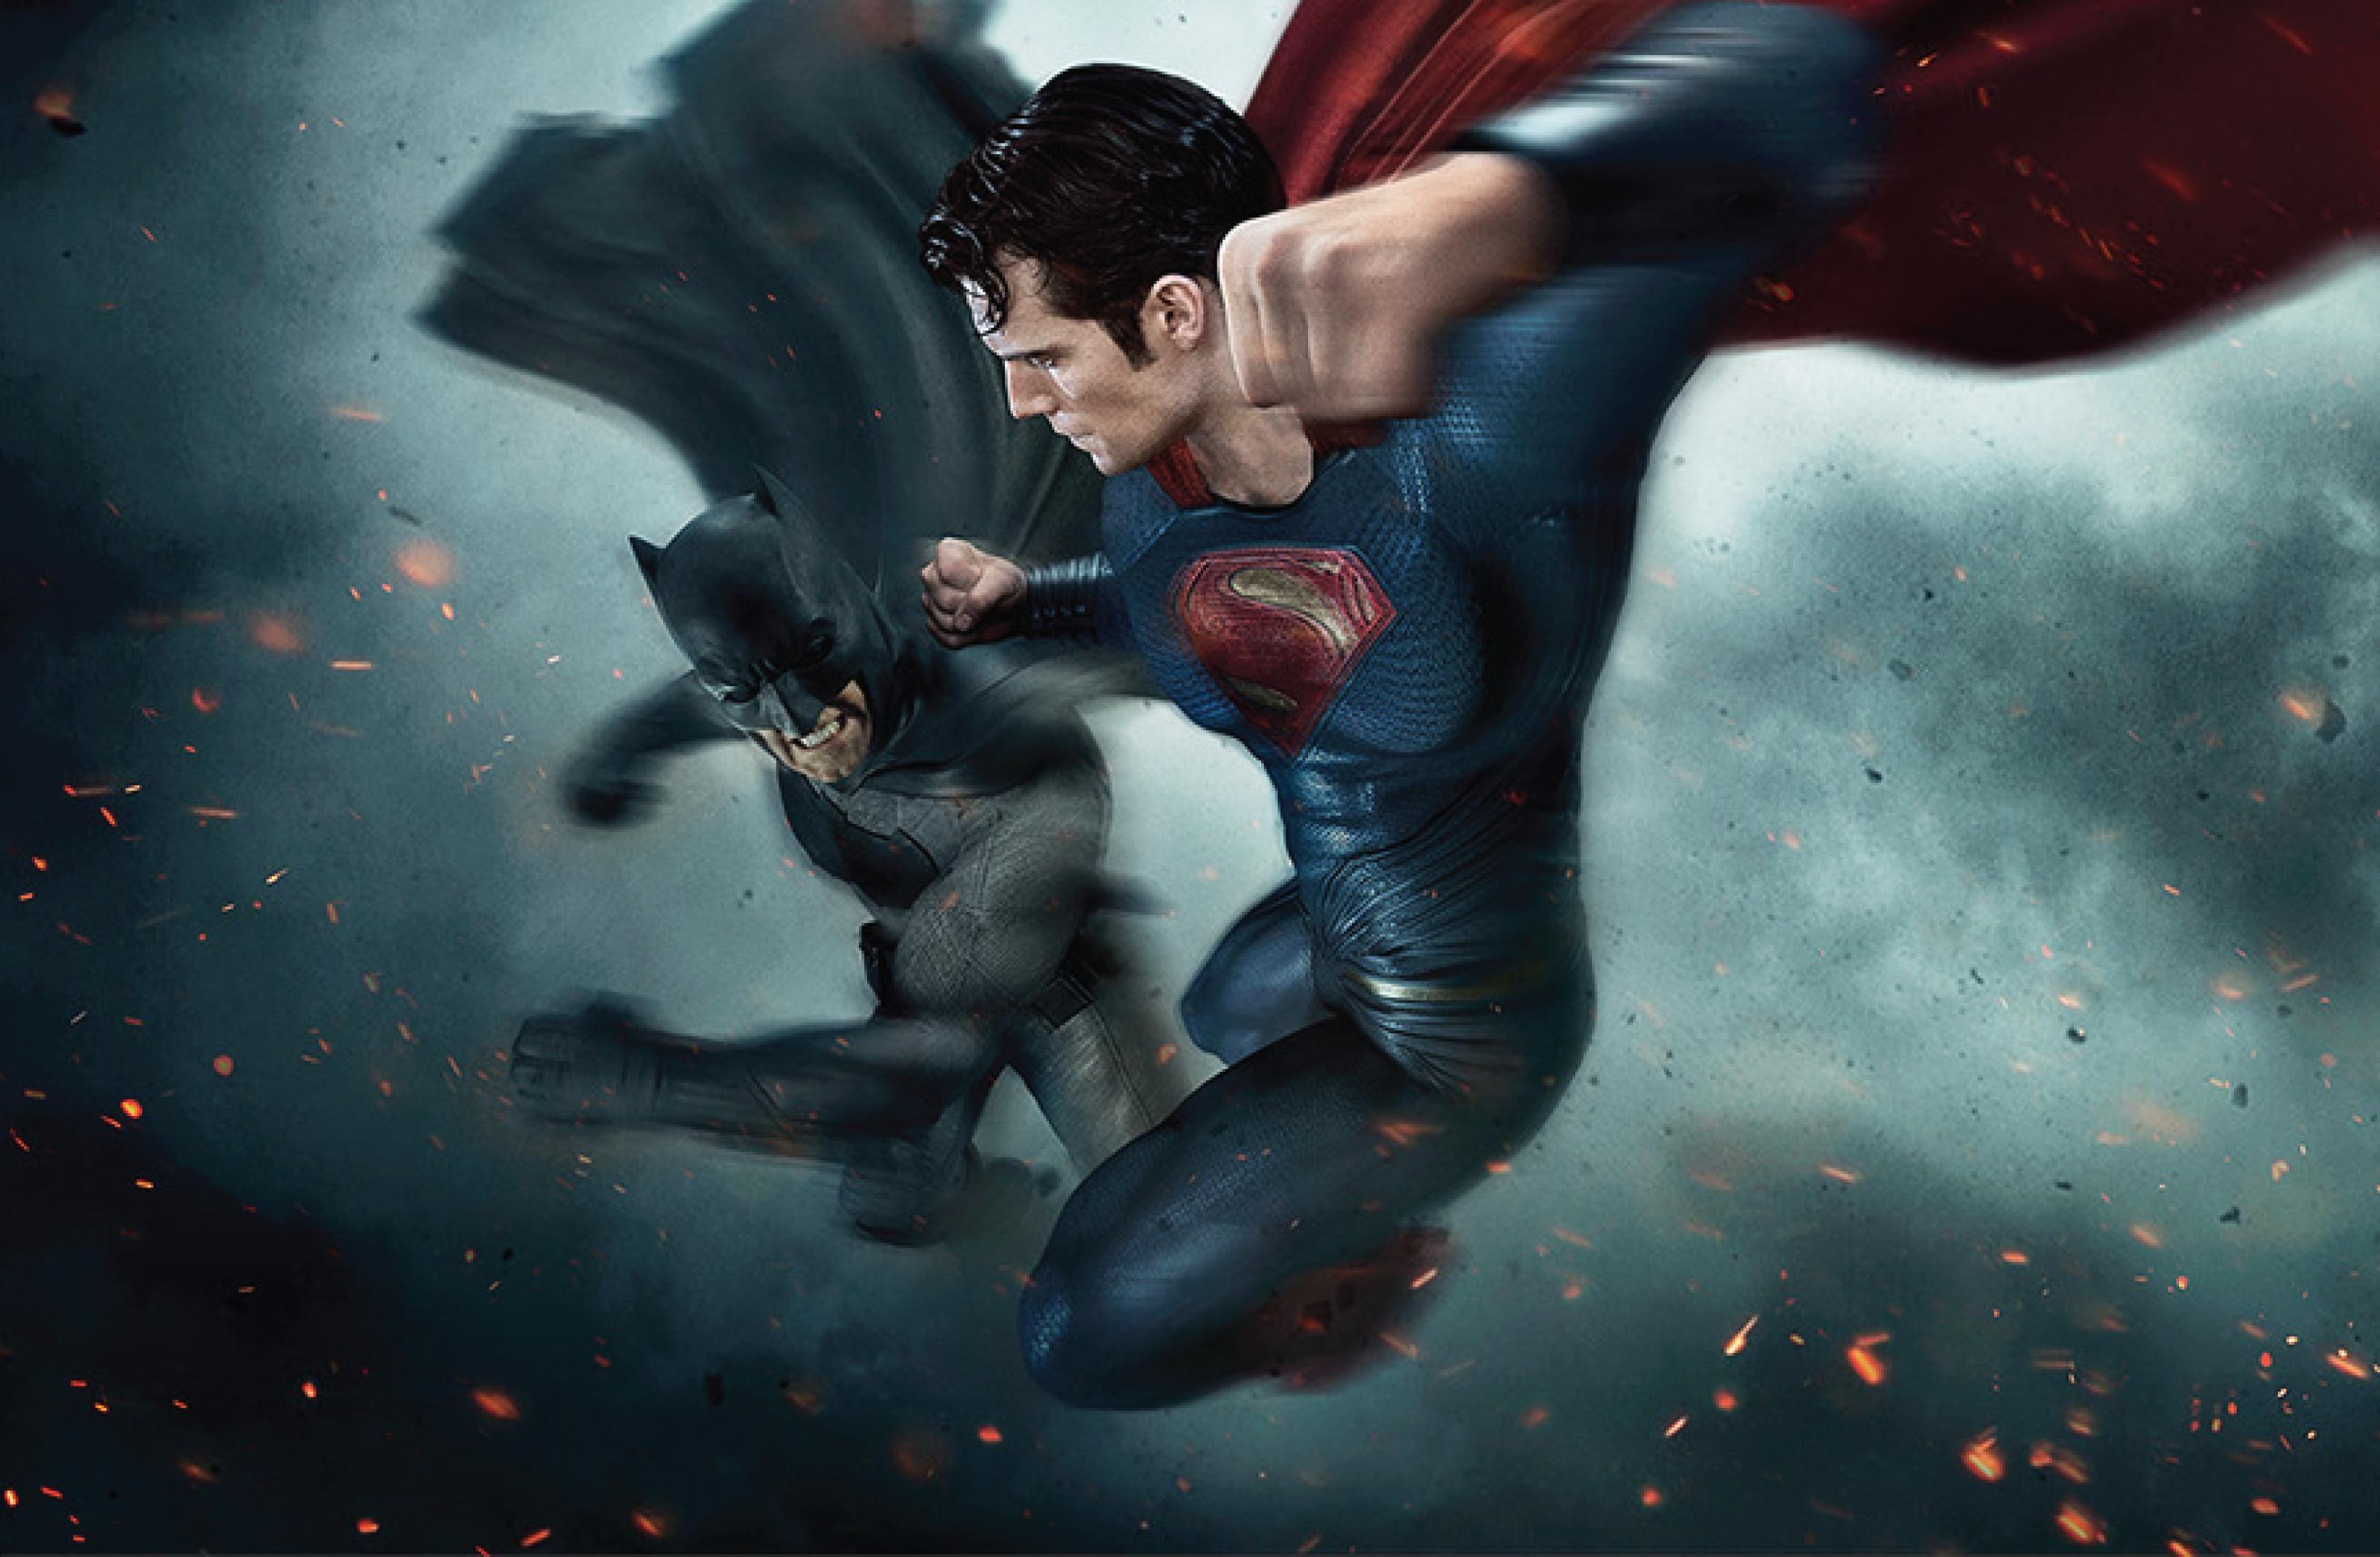 Batman V Superman Dawn Of Justice Wallpaper Gifs Avvy Thread